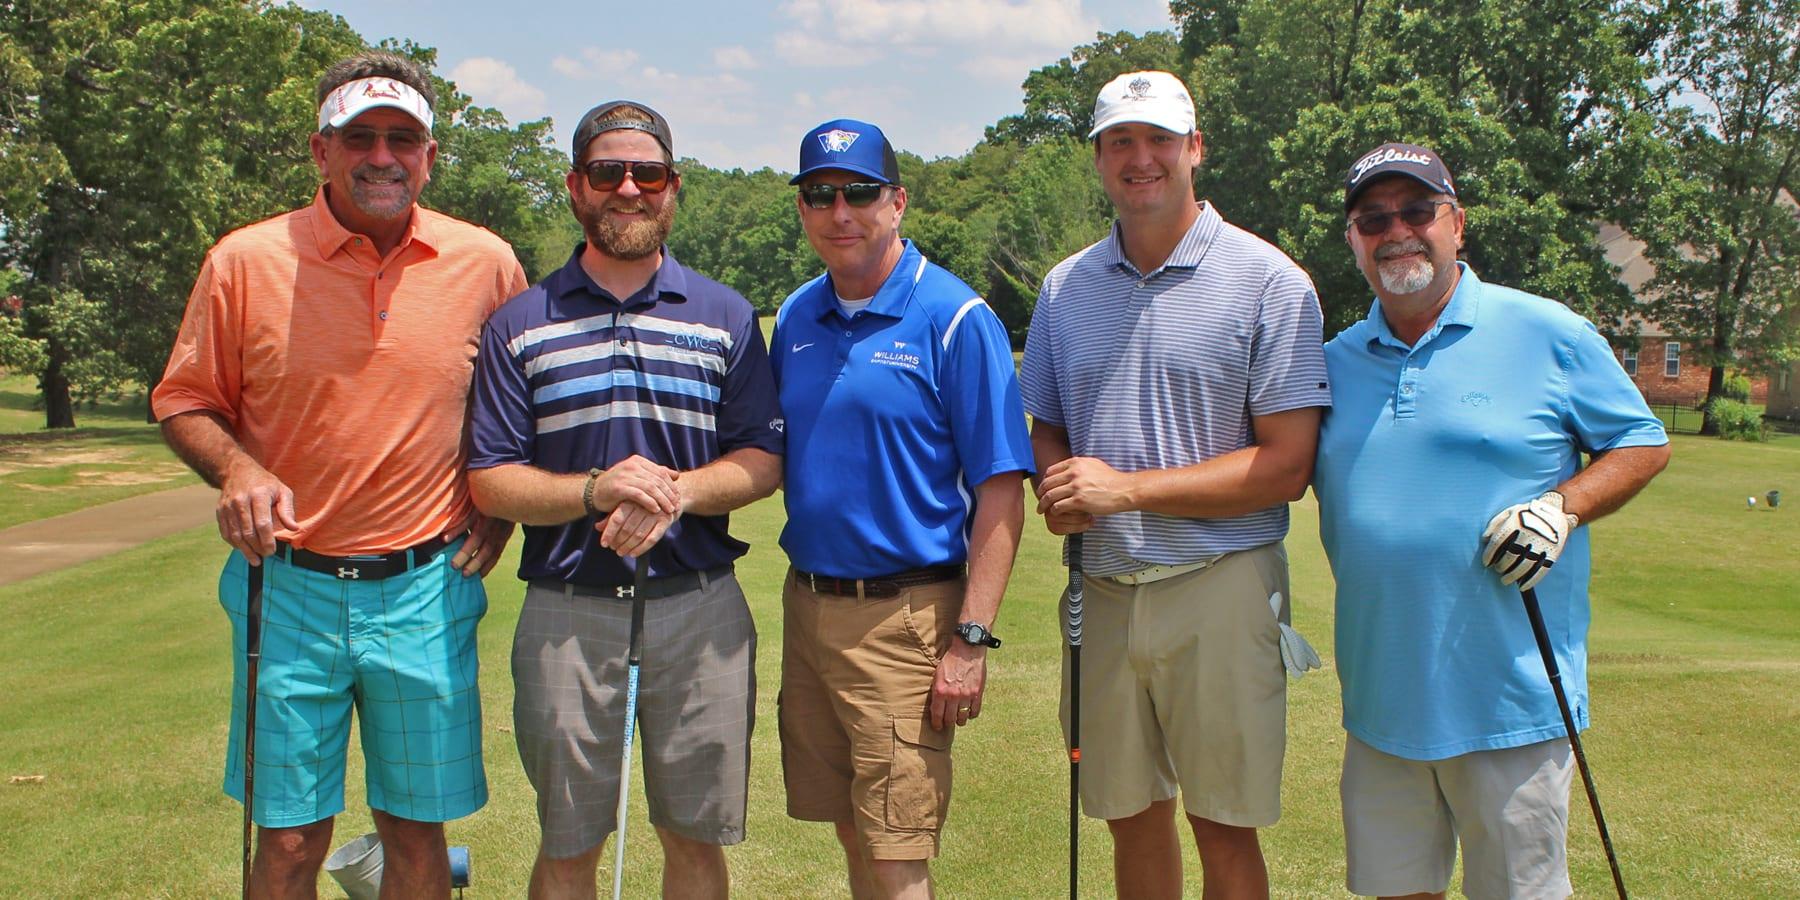 Winners Announced In WBU Golf Tourney